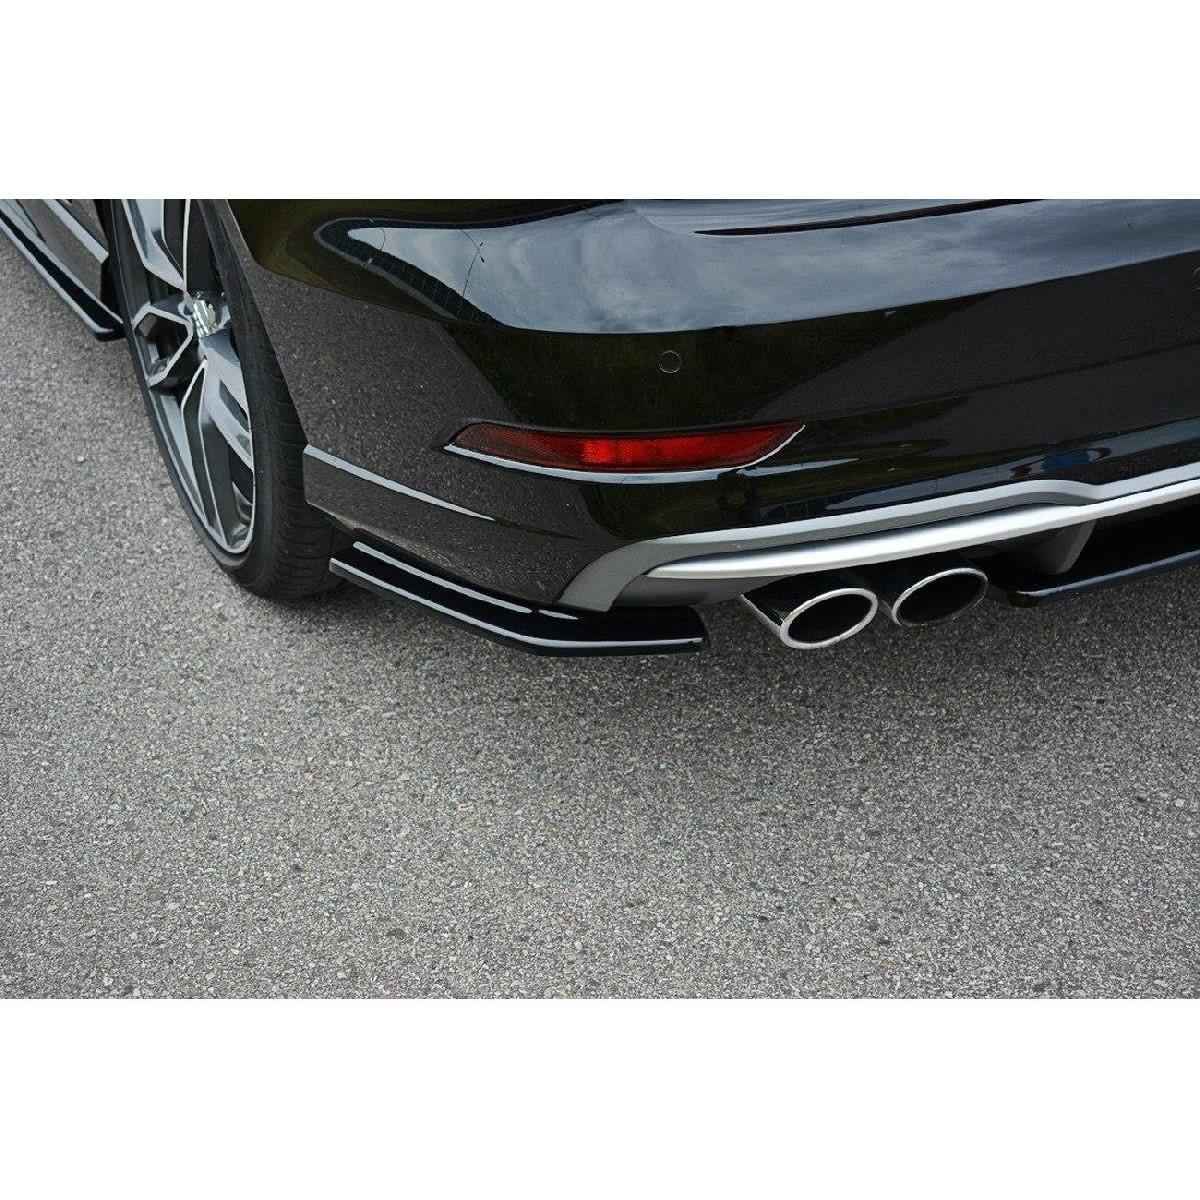 Heck Ansatz Flaps Diffusor für Audi S3 / A3 S-Line 8V FL Limousine schwarz matt